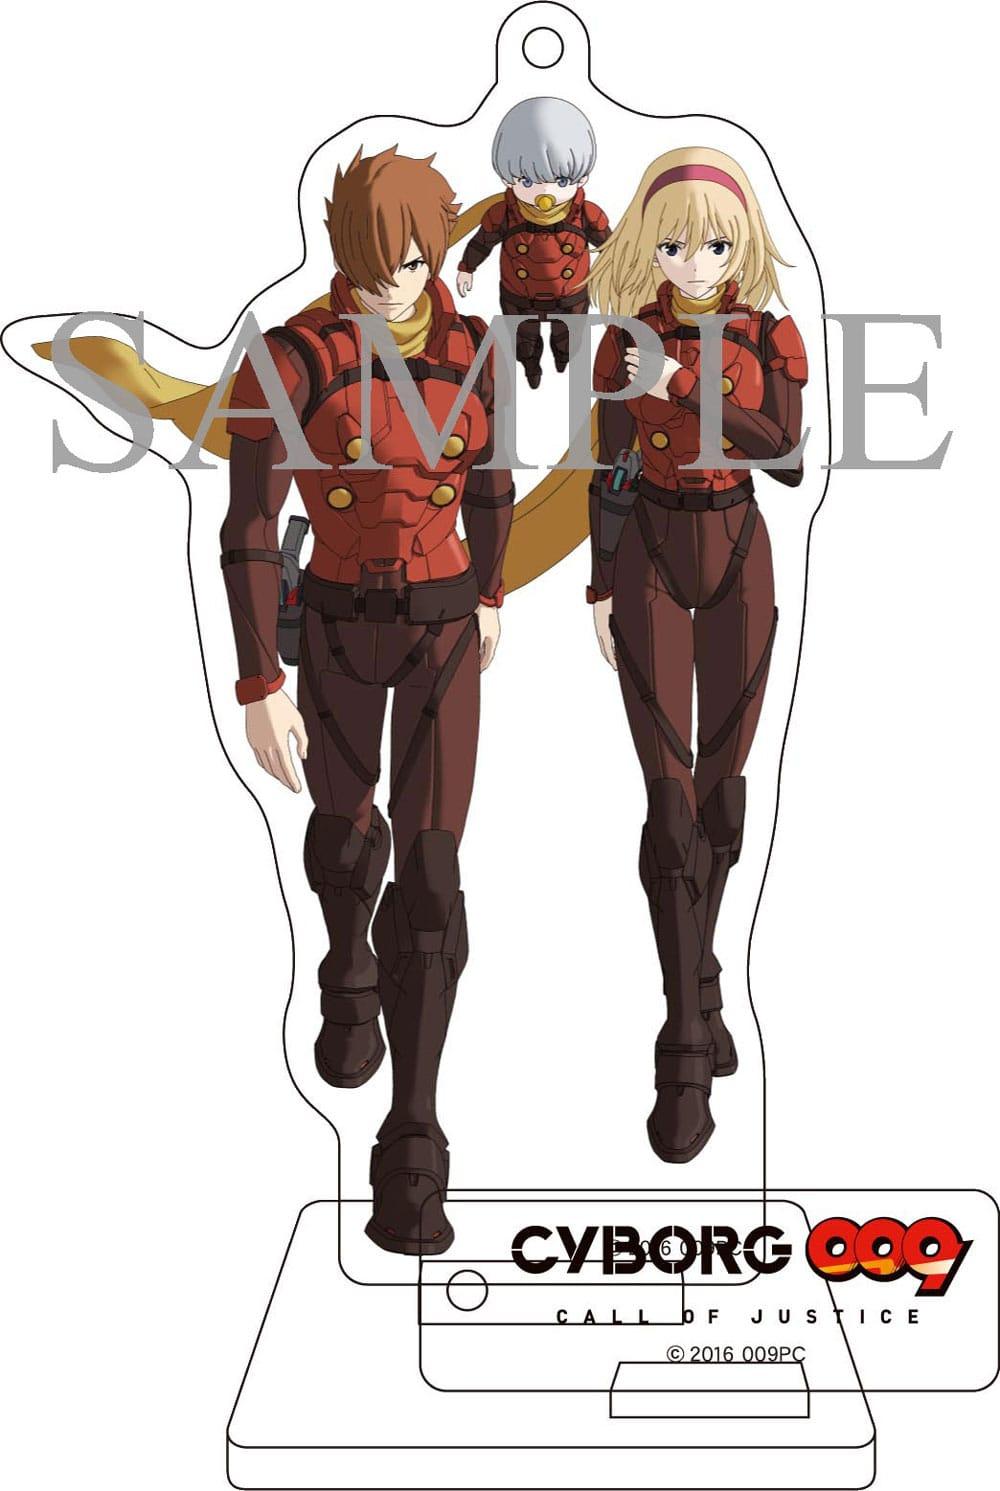 【TOHO animation STORE 限定版】CYBORG009 CALL OF JUSTICE Vol.1 Blu-ray 初回生産限定版+オリジナルアクリルスタンディセット